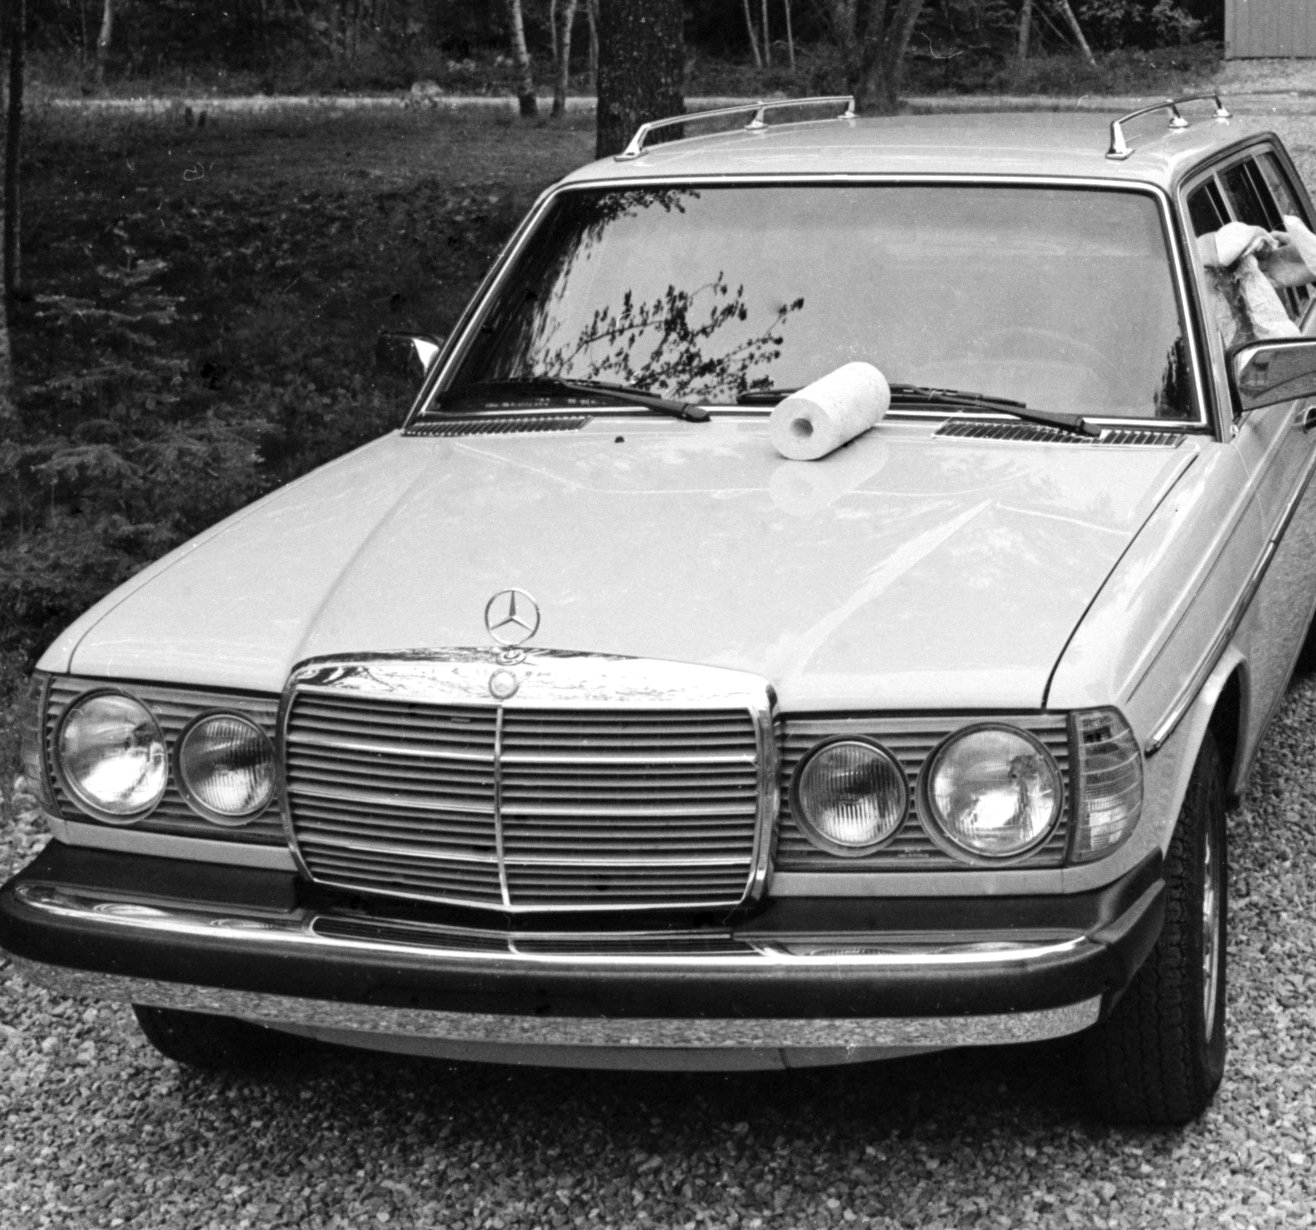 Salt Water New England: Preppy Cars